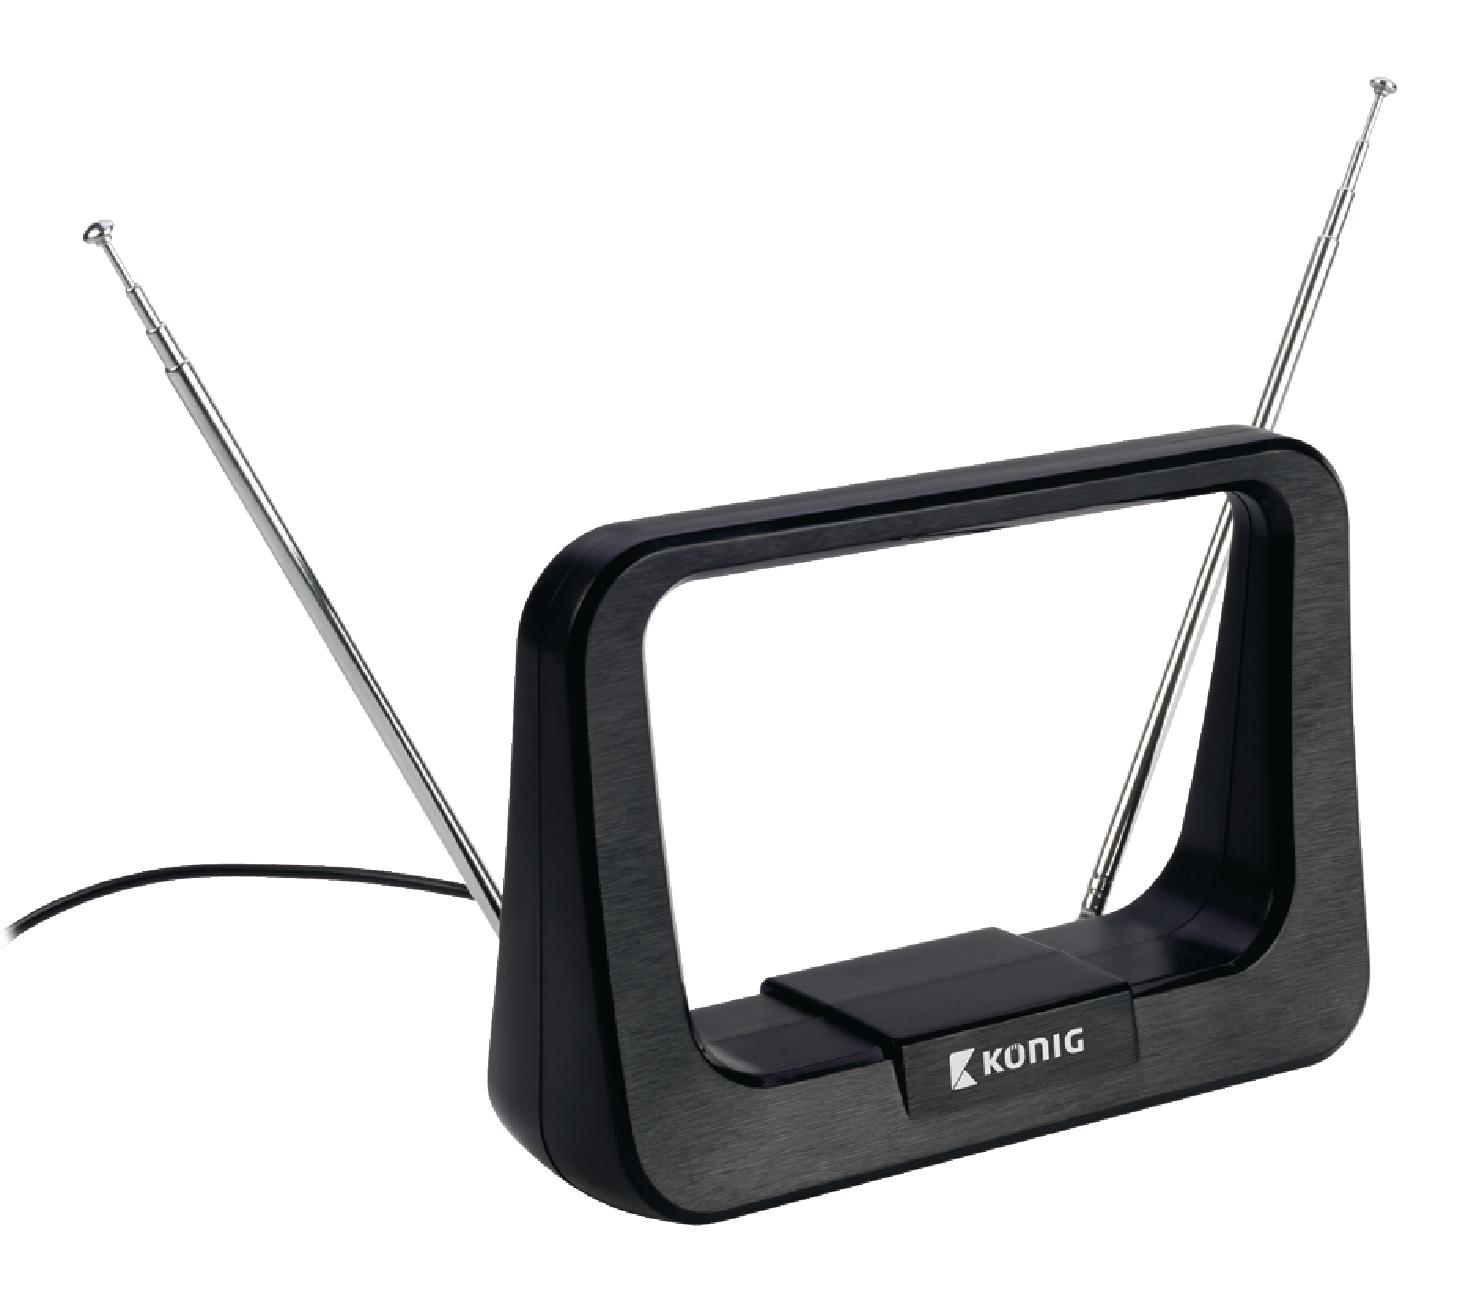 König ANT 116-KN vnitřní DVB-T/T2-DAB+ anténa 7 dB FM/VHF/UHF